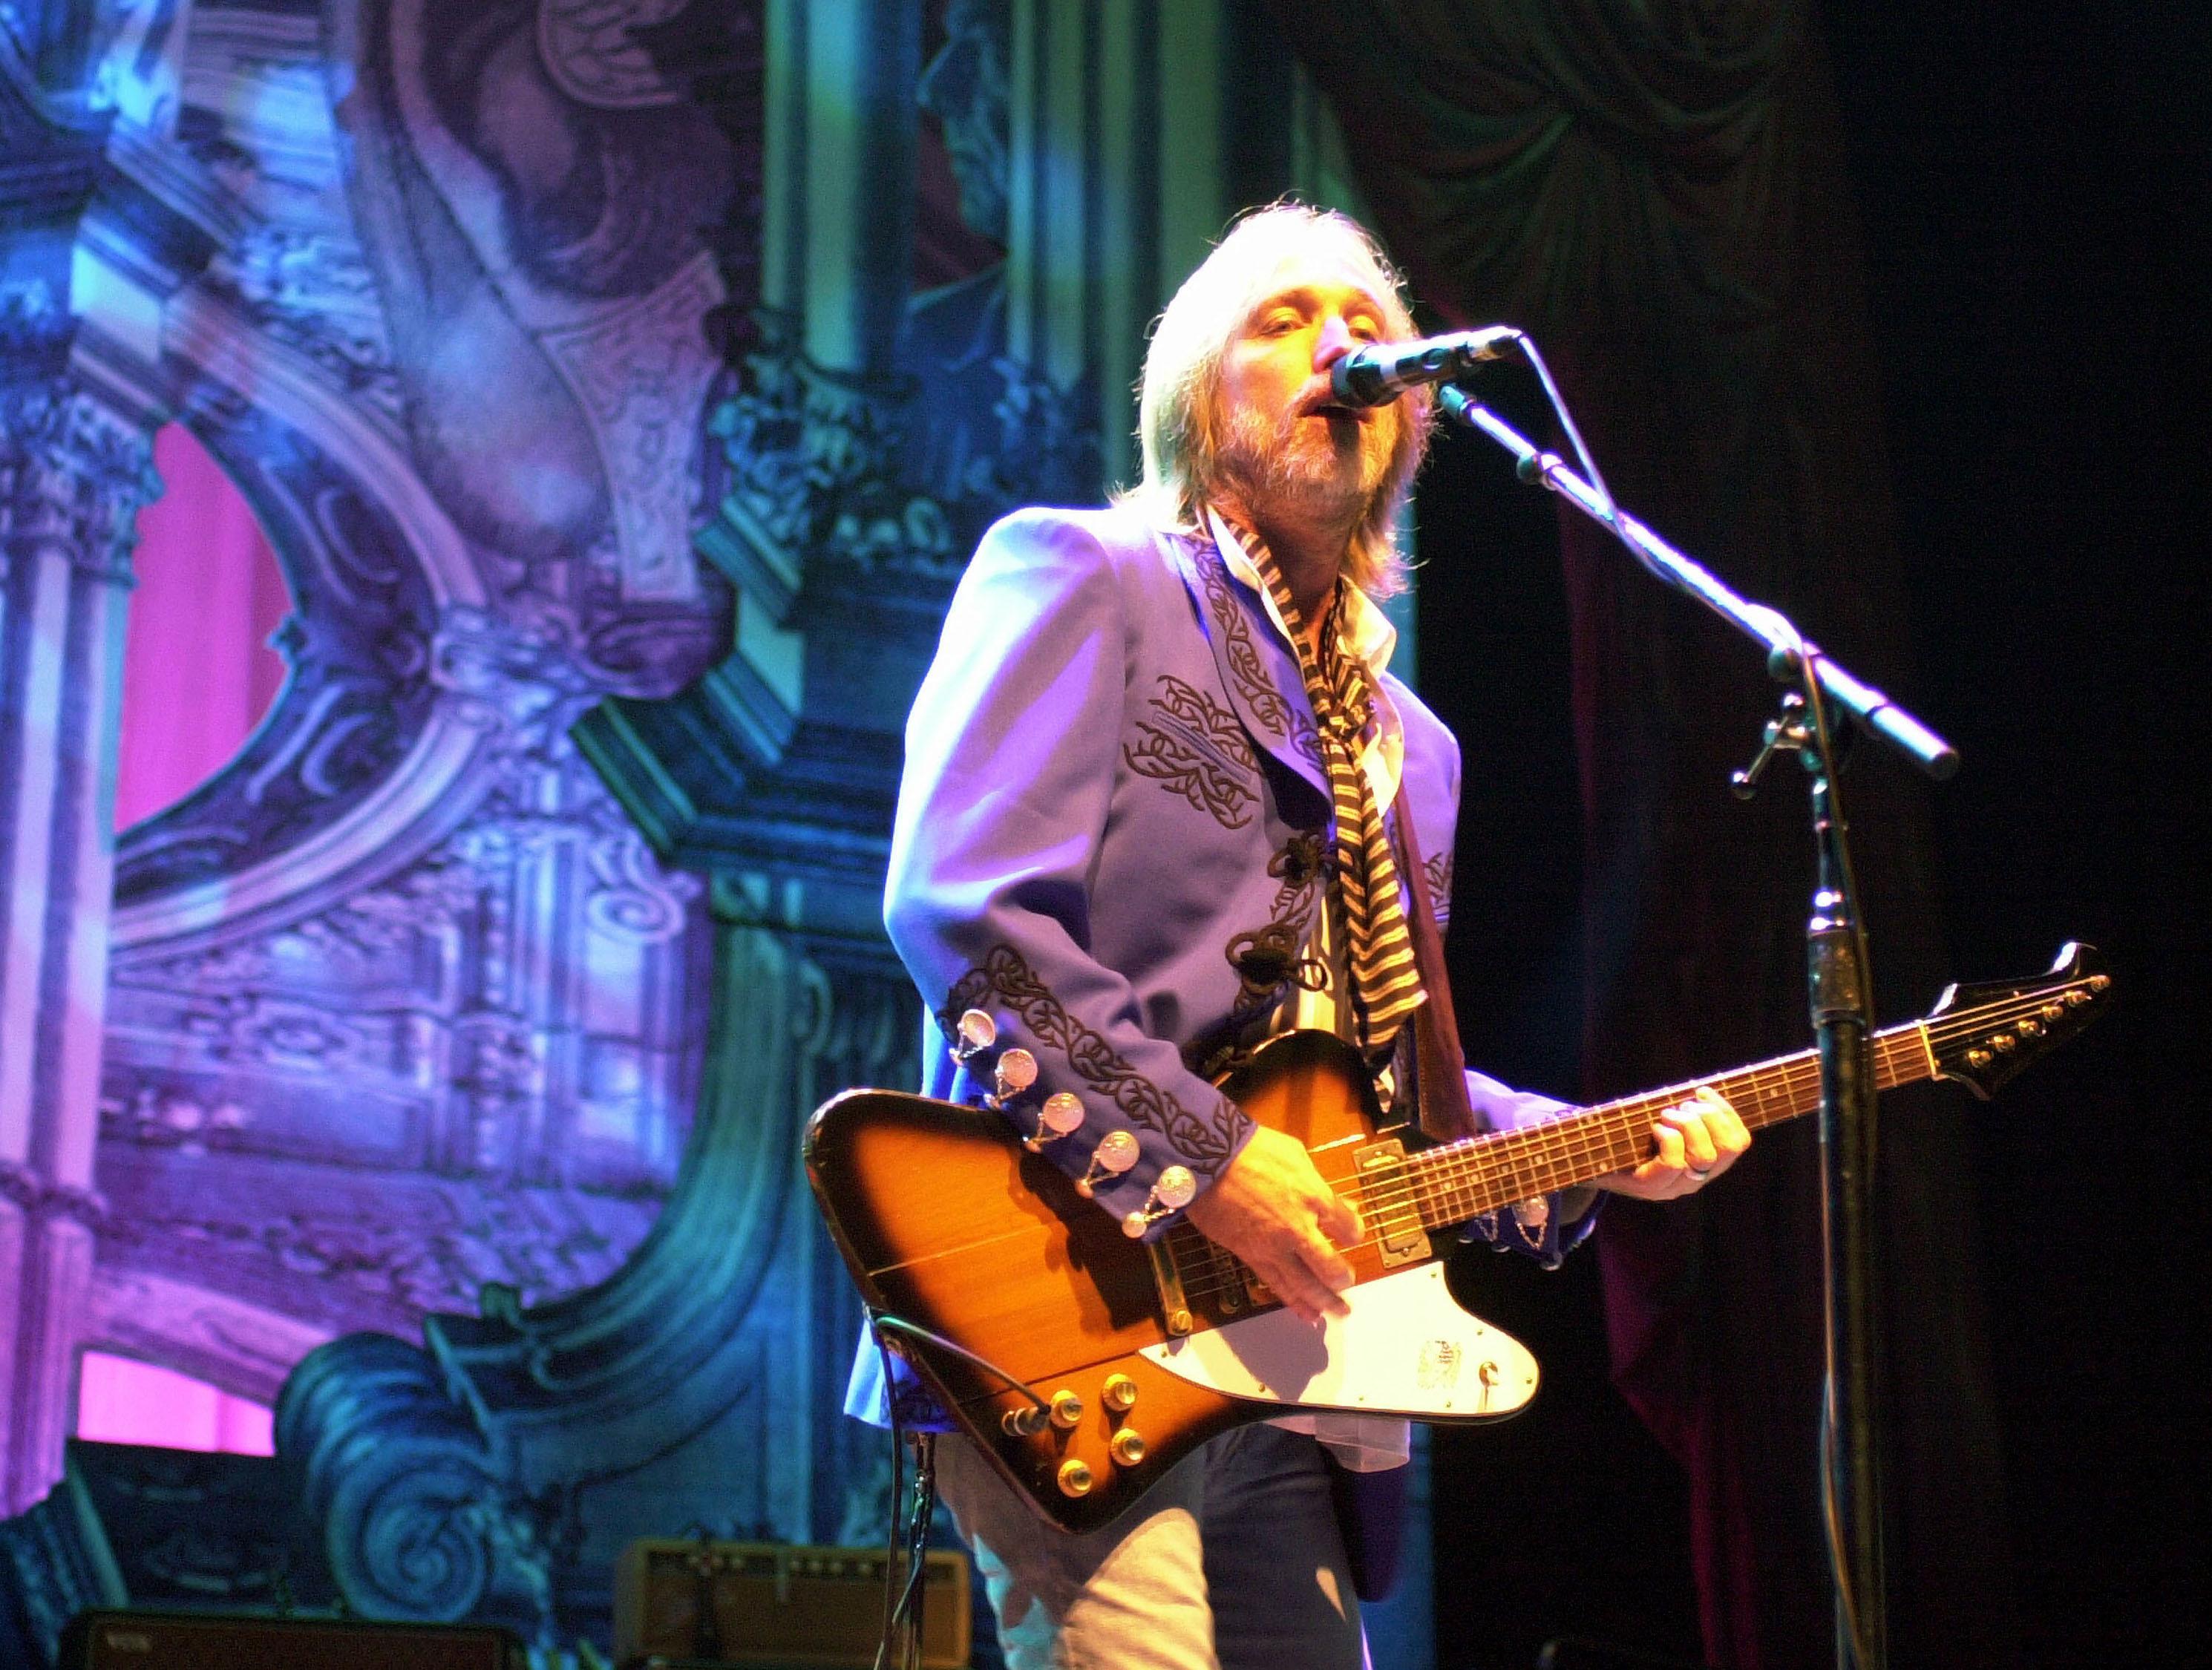 Милиция озвучила причину смерти рок-музыканта Тома Петти